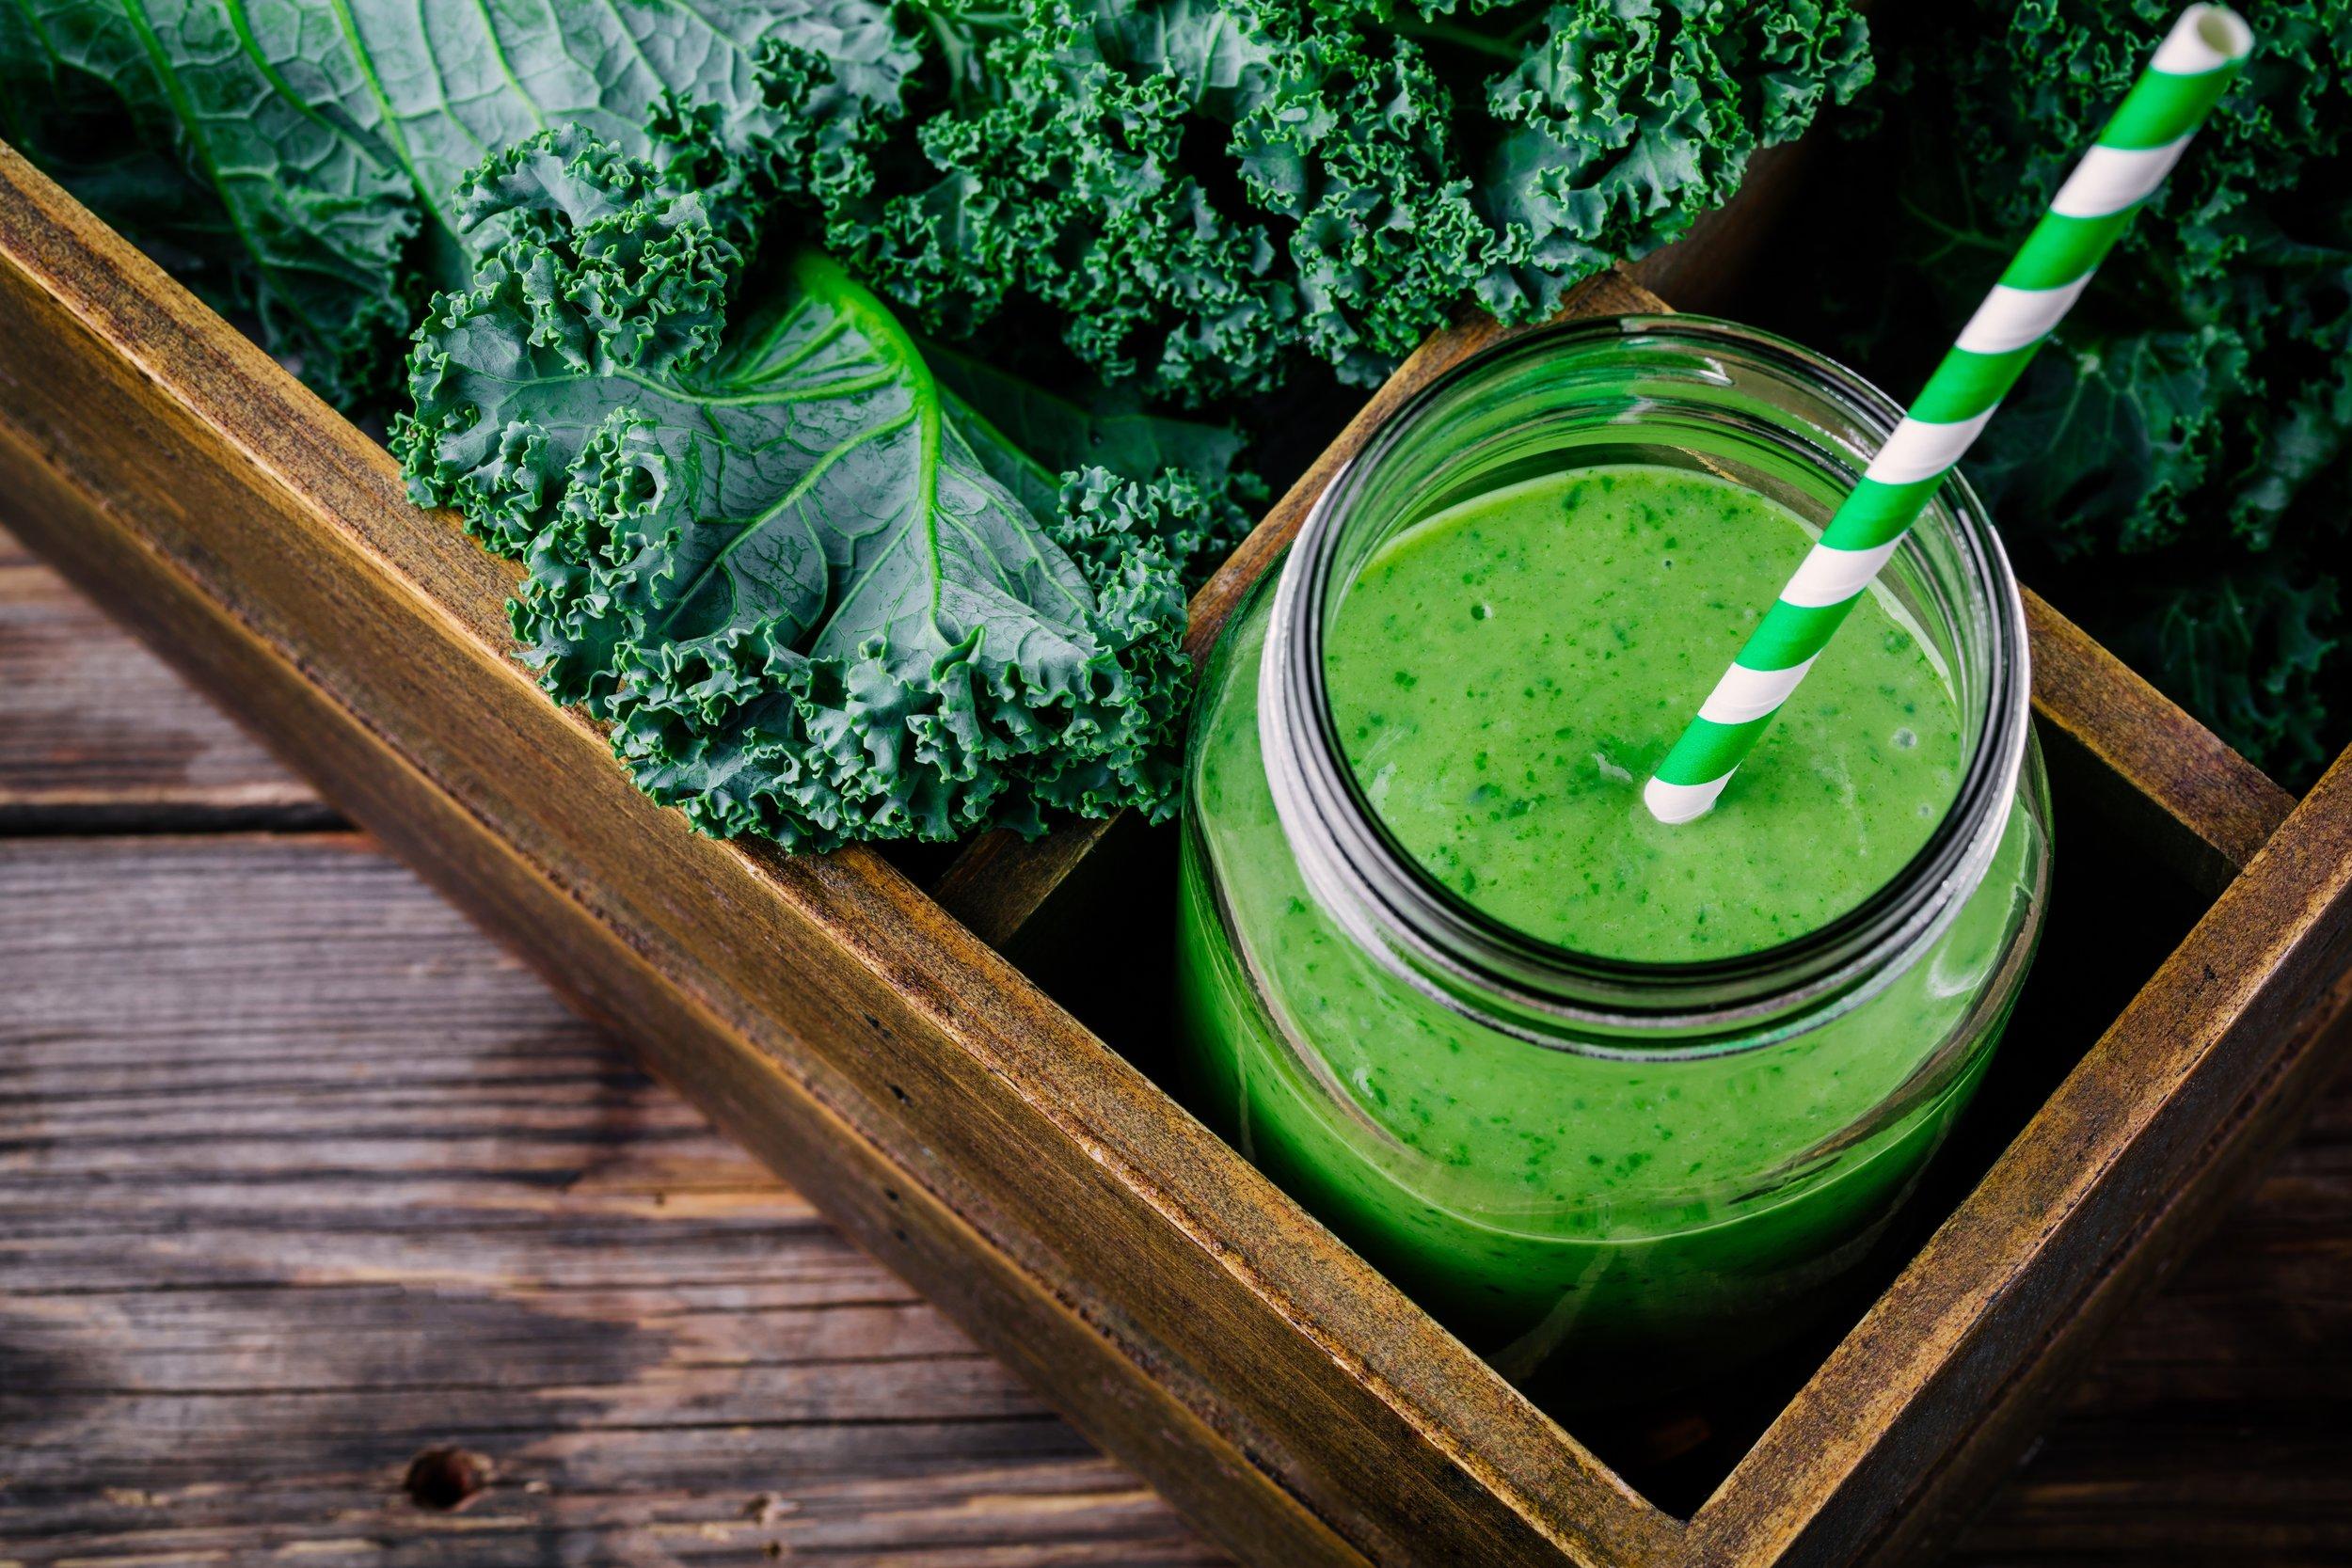 Kuvings_kale_green_juice_recipe.jpeg